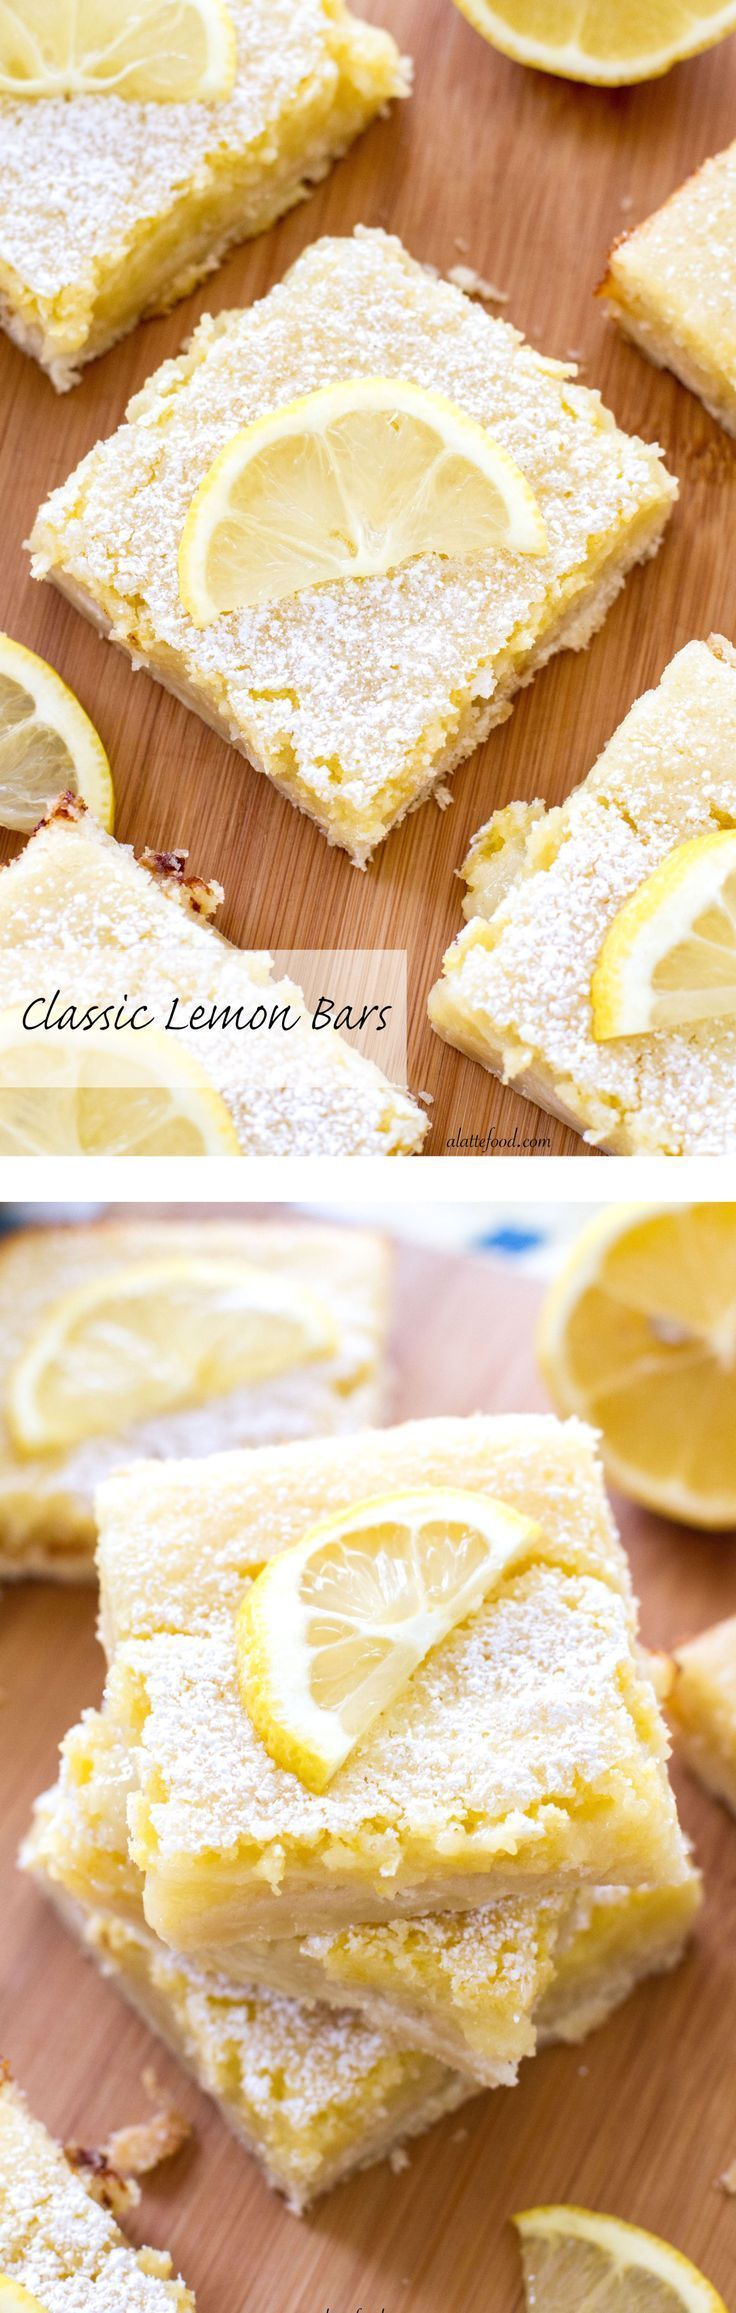 Best 25+ Spring desserts ideas on Pinterest | Recipe for ...